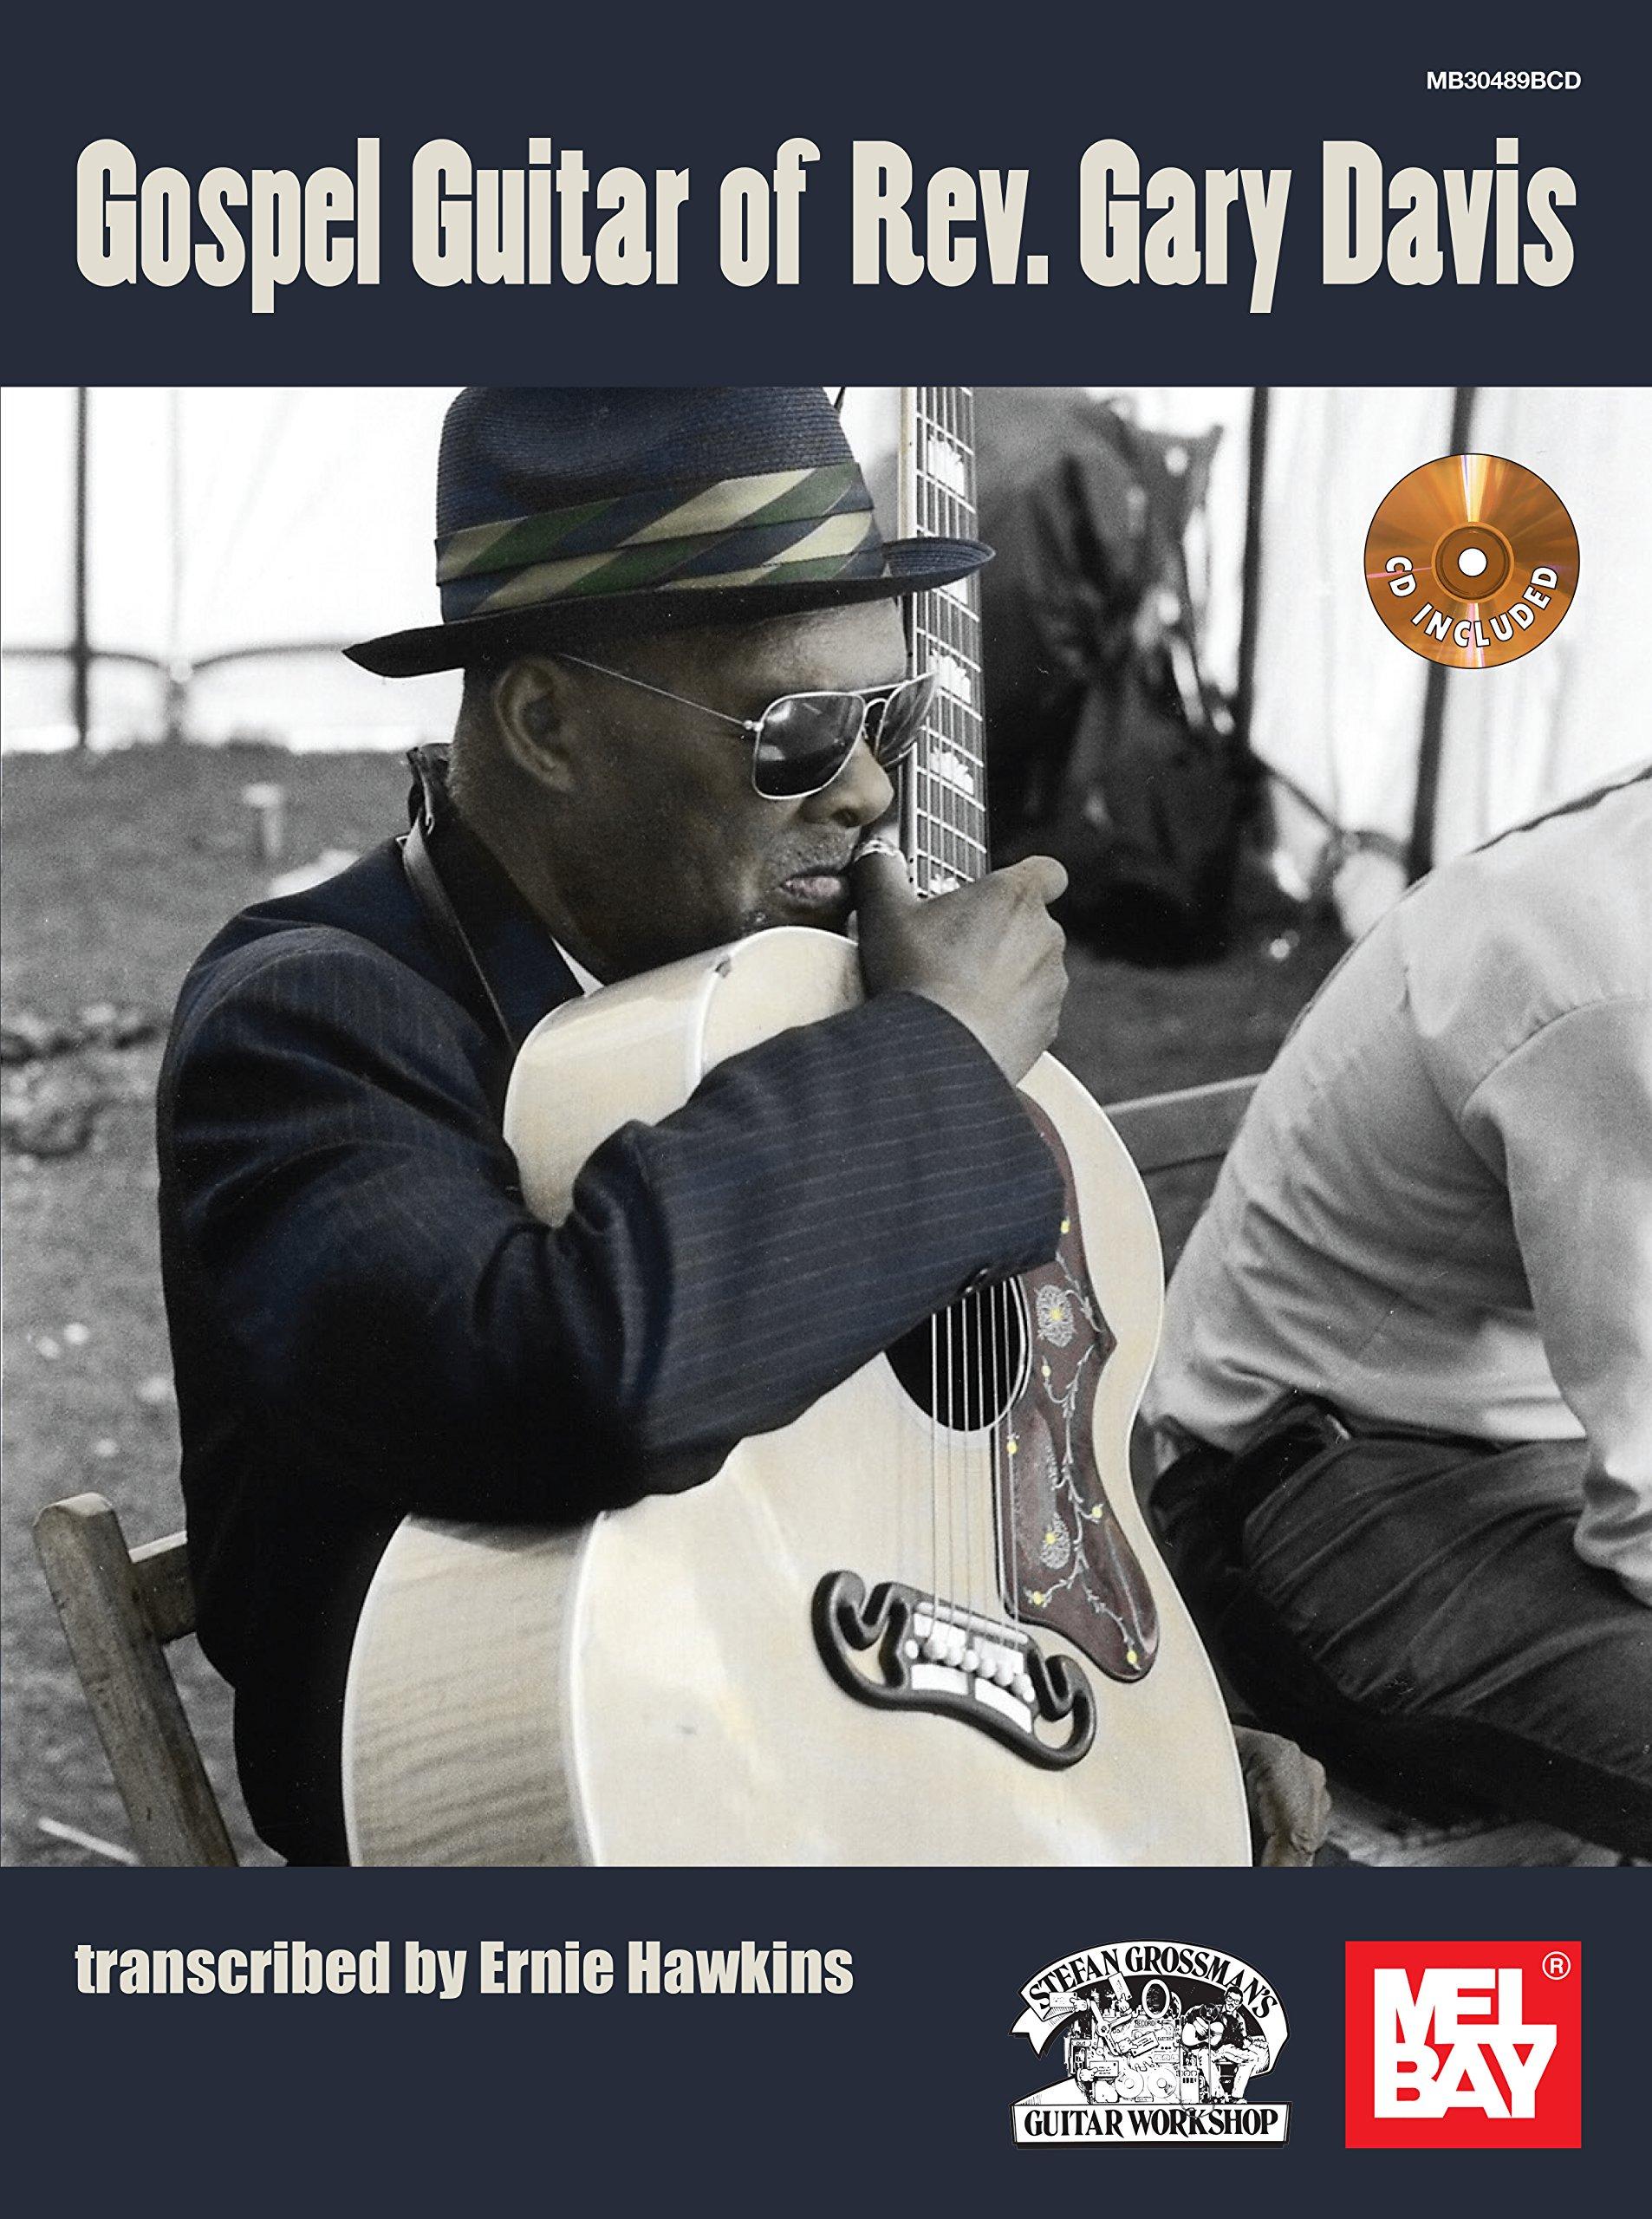 Gospel Guitar of Rev. Gary Davis by Mel Bay